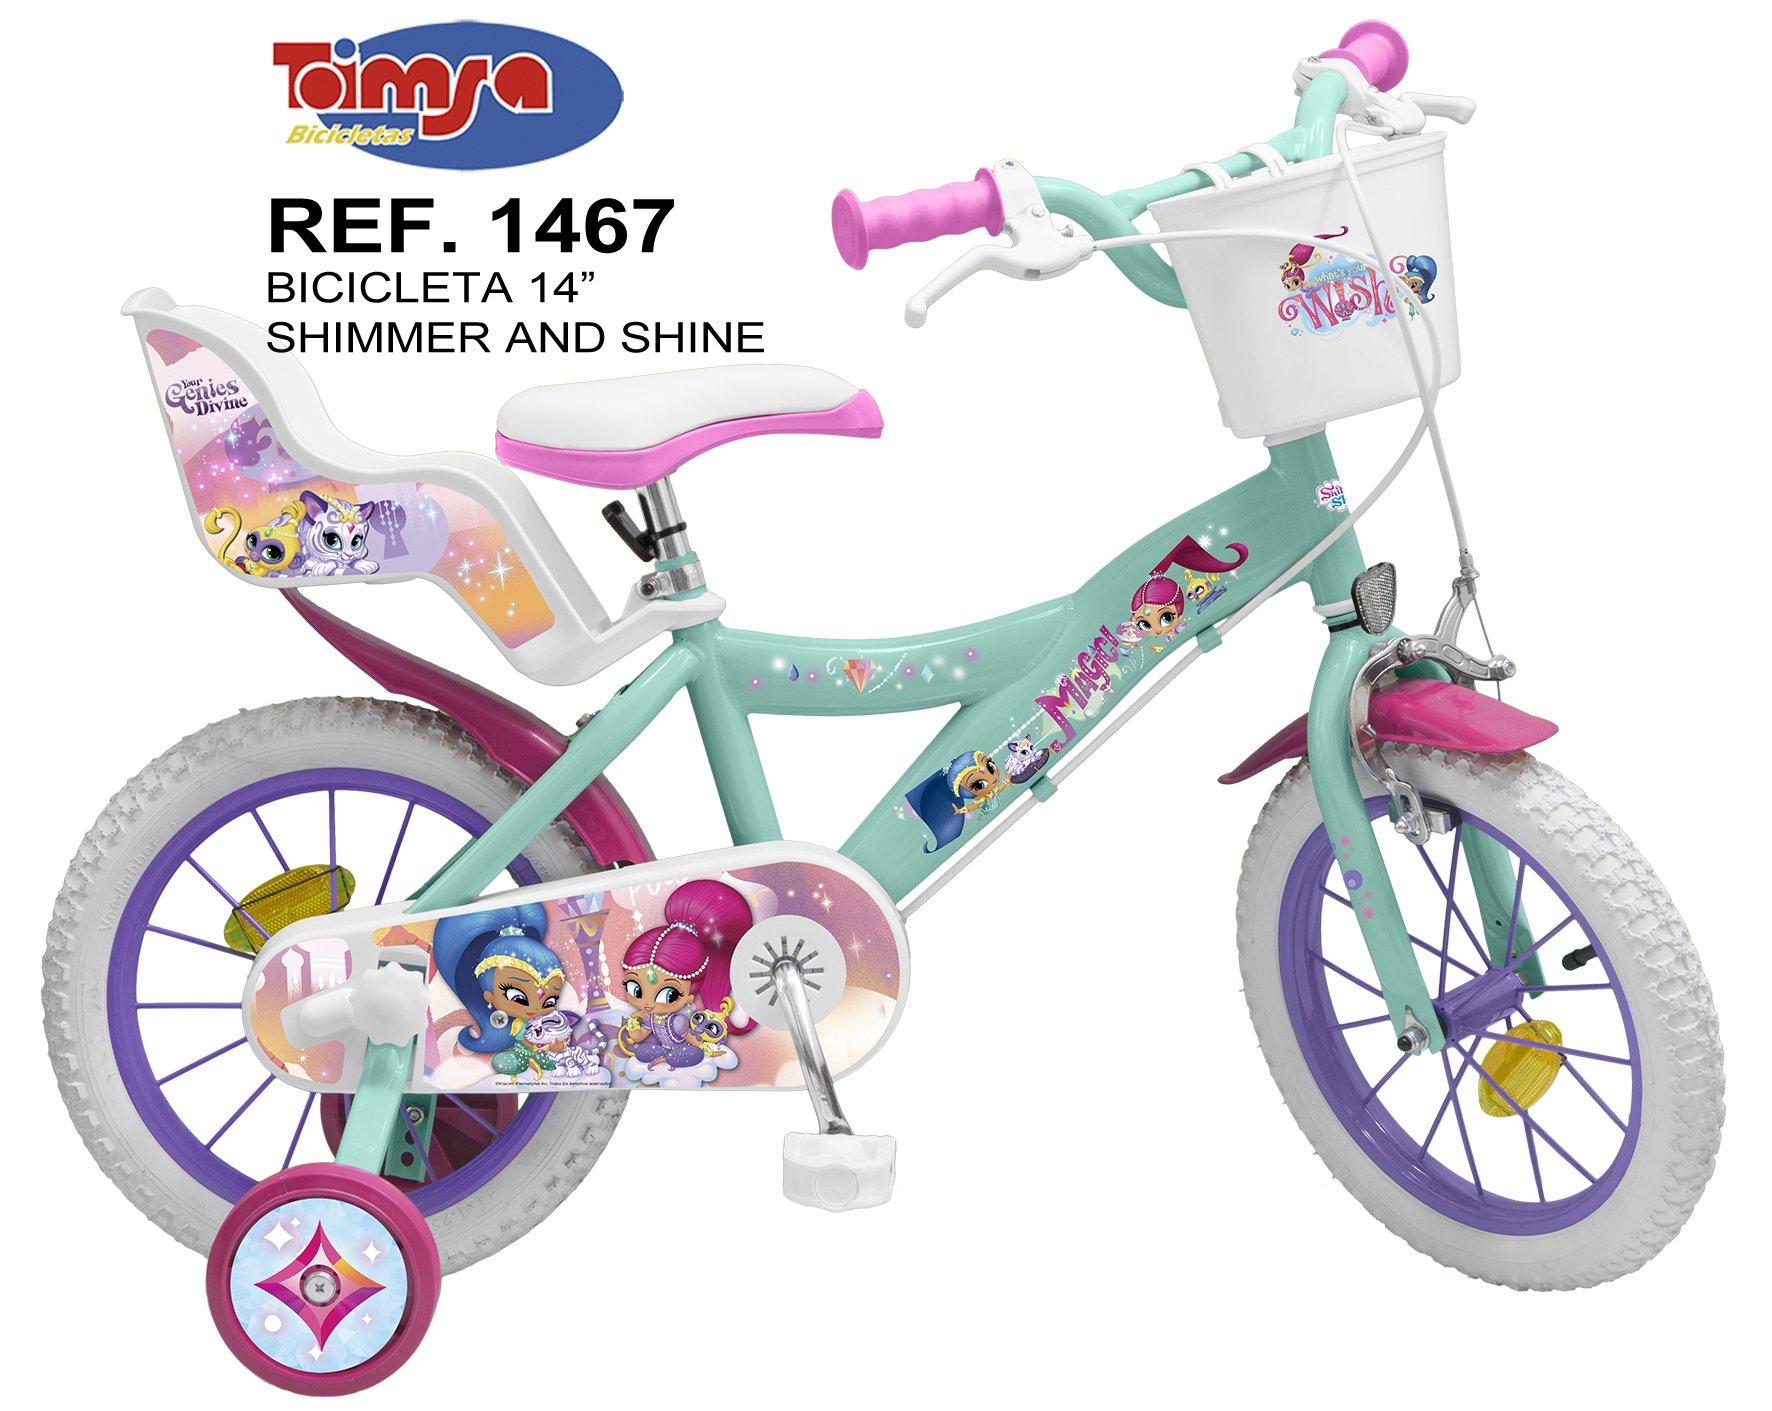 Bicicleta Shimmer and Shine 14 pulgadas width=